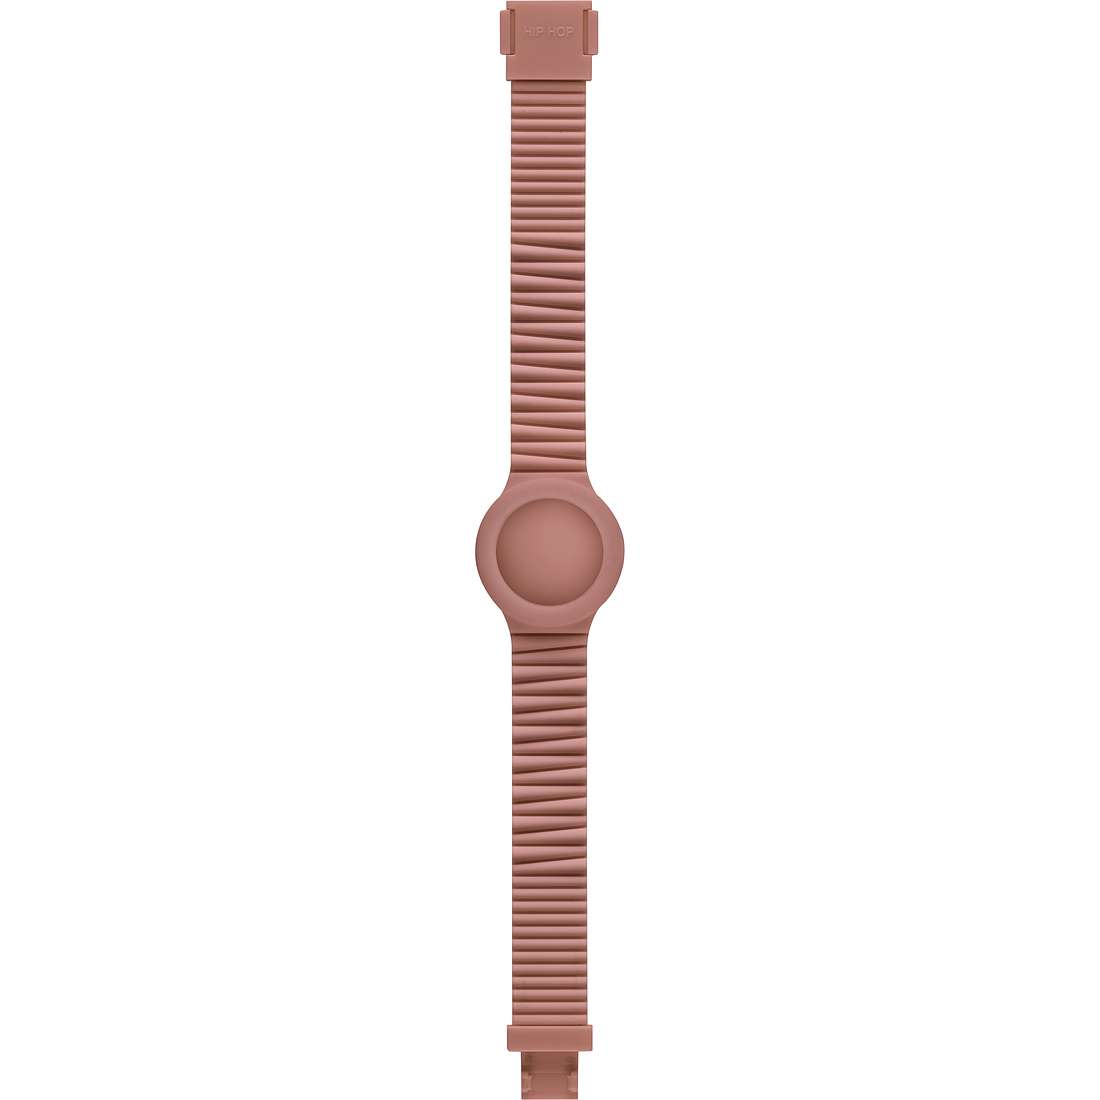 orologio accessorio donna Hip Hop Sensoriality HBU0507